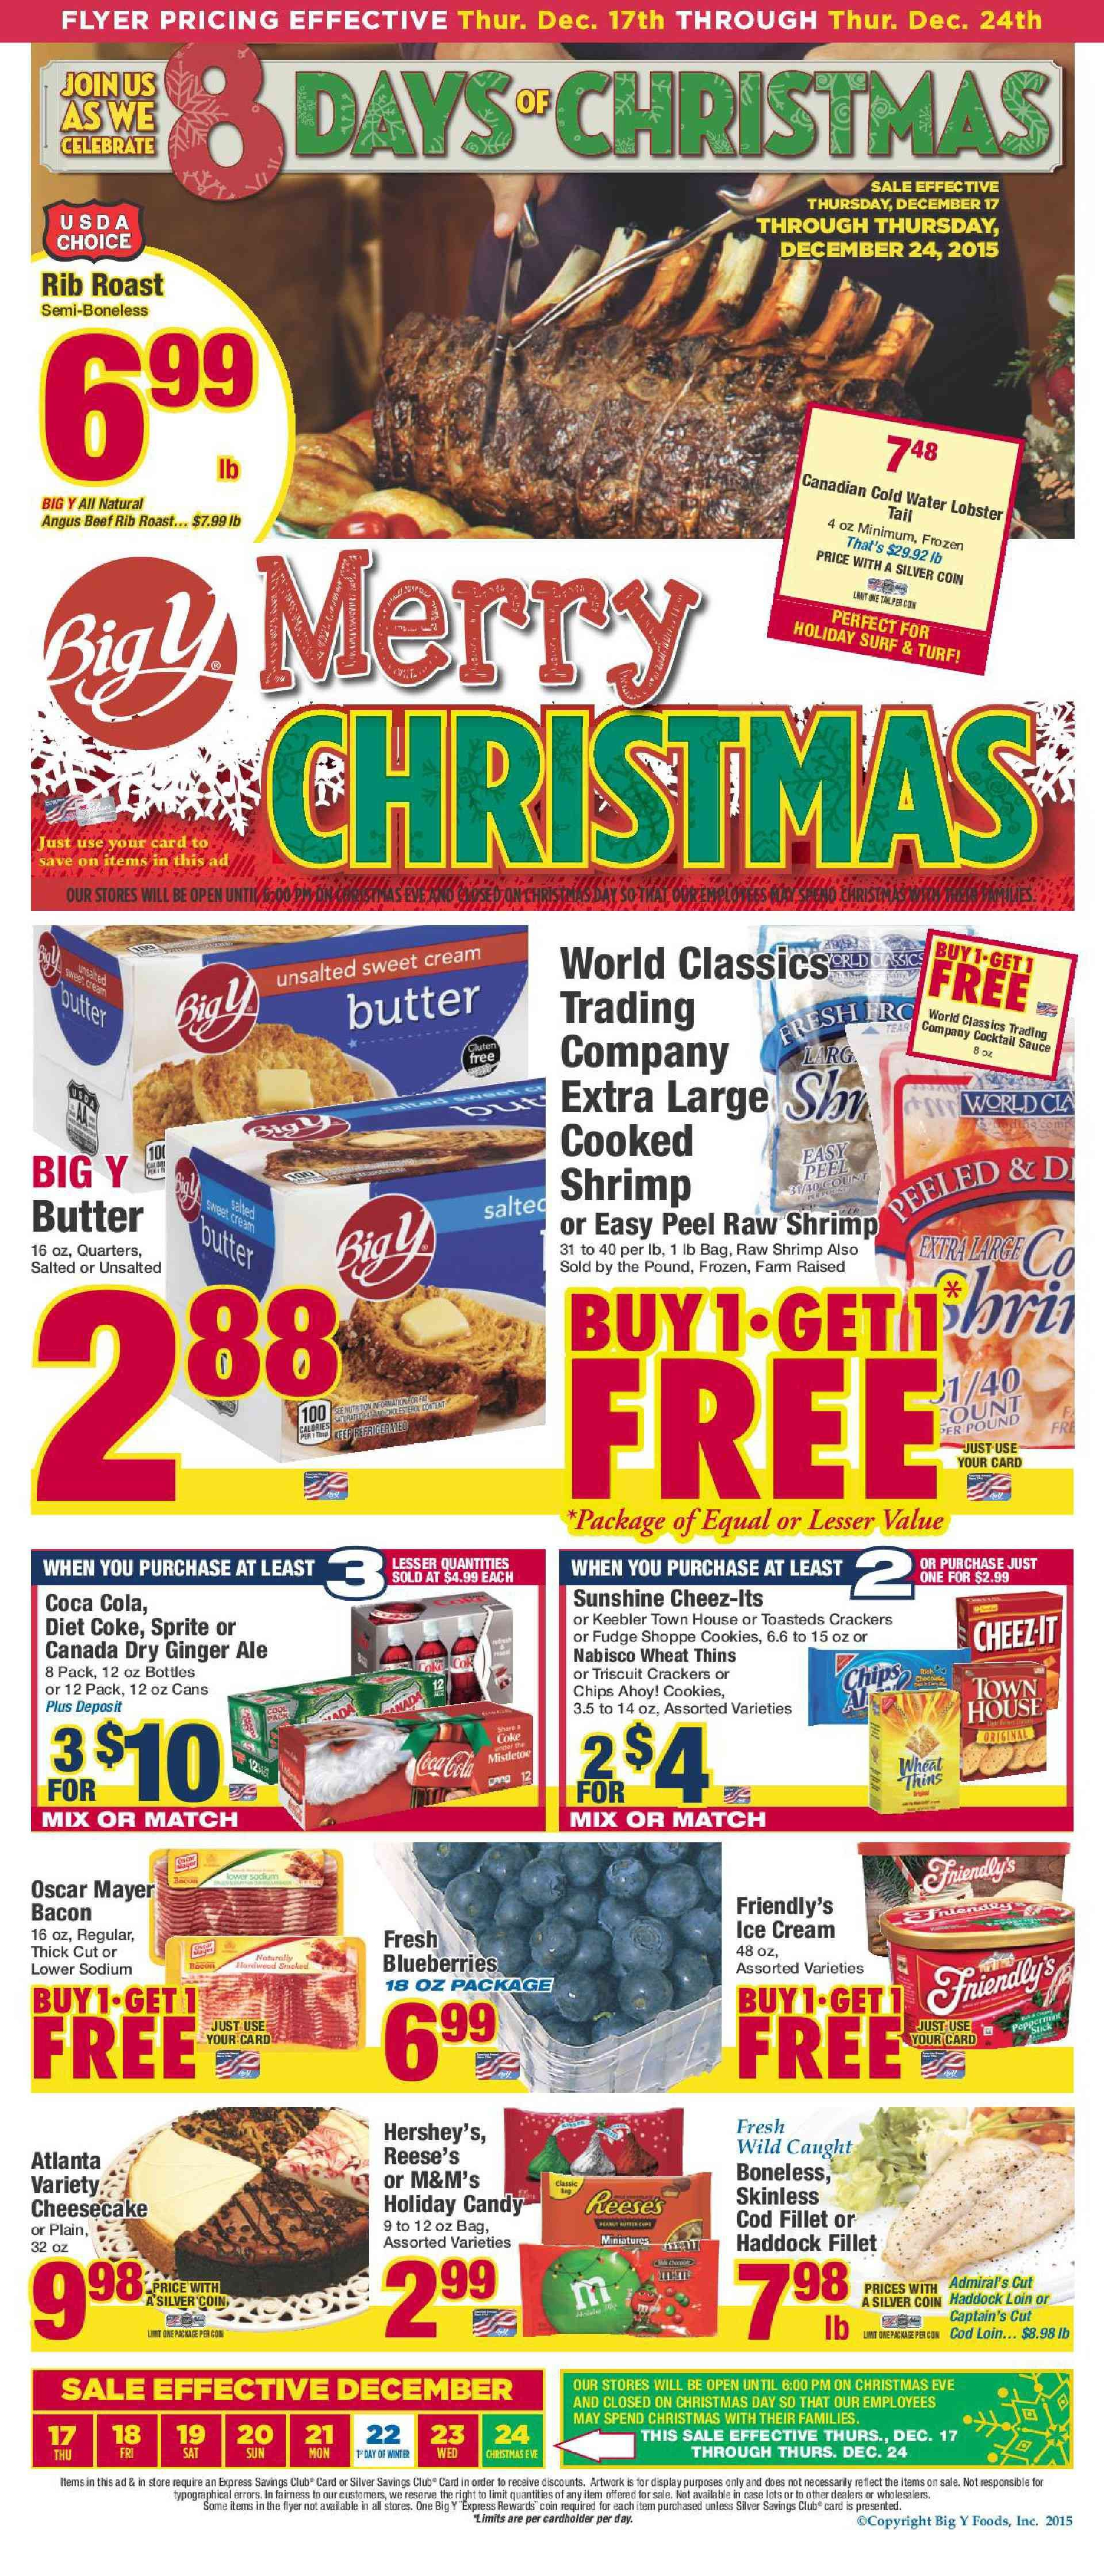 Big y circular december 10 16 2015 weekly ads and